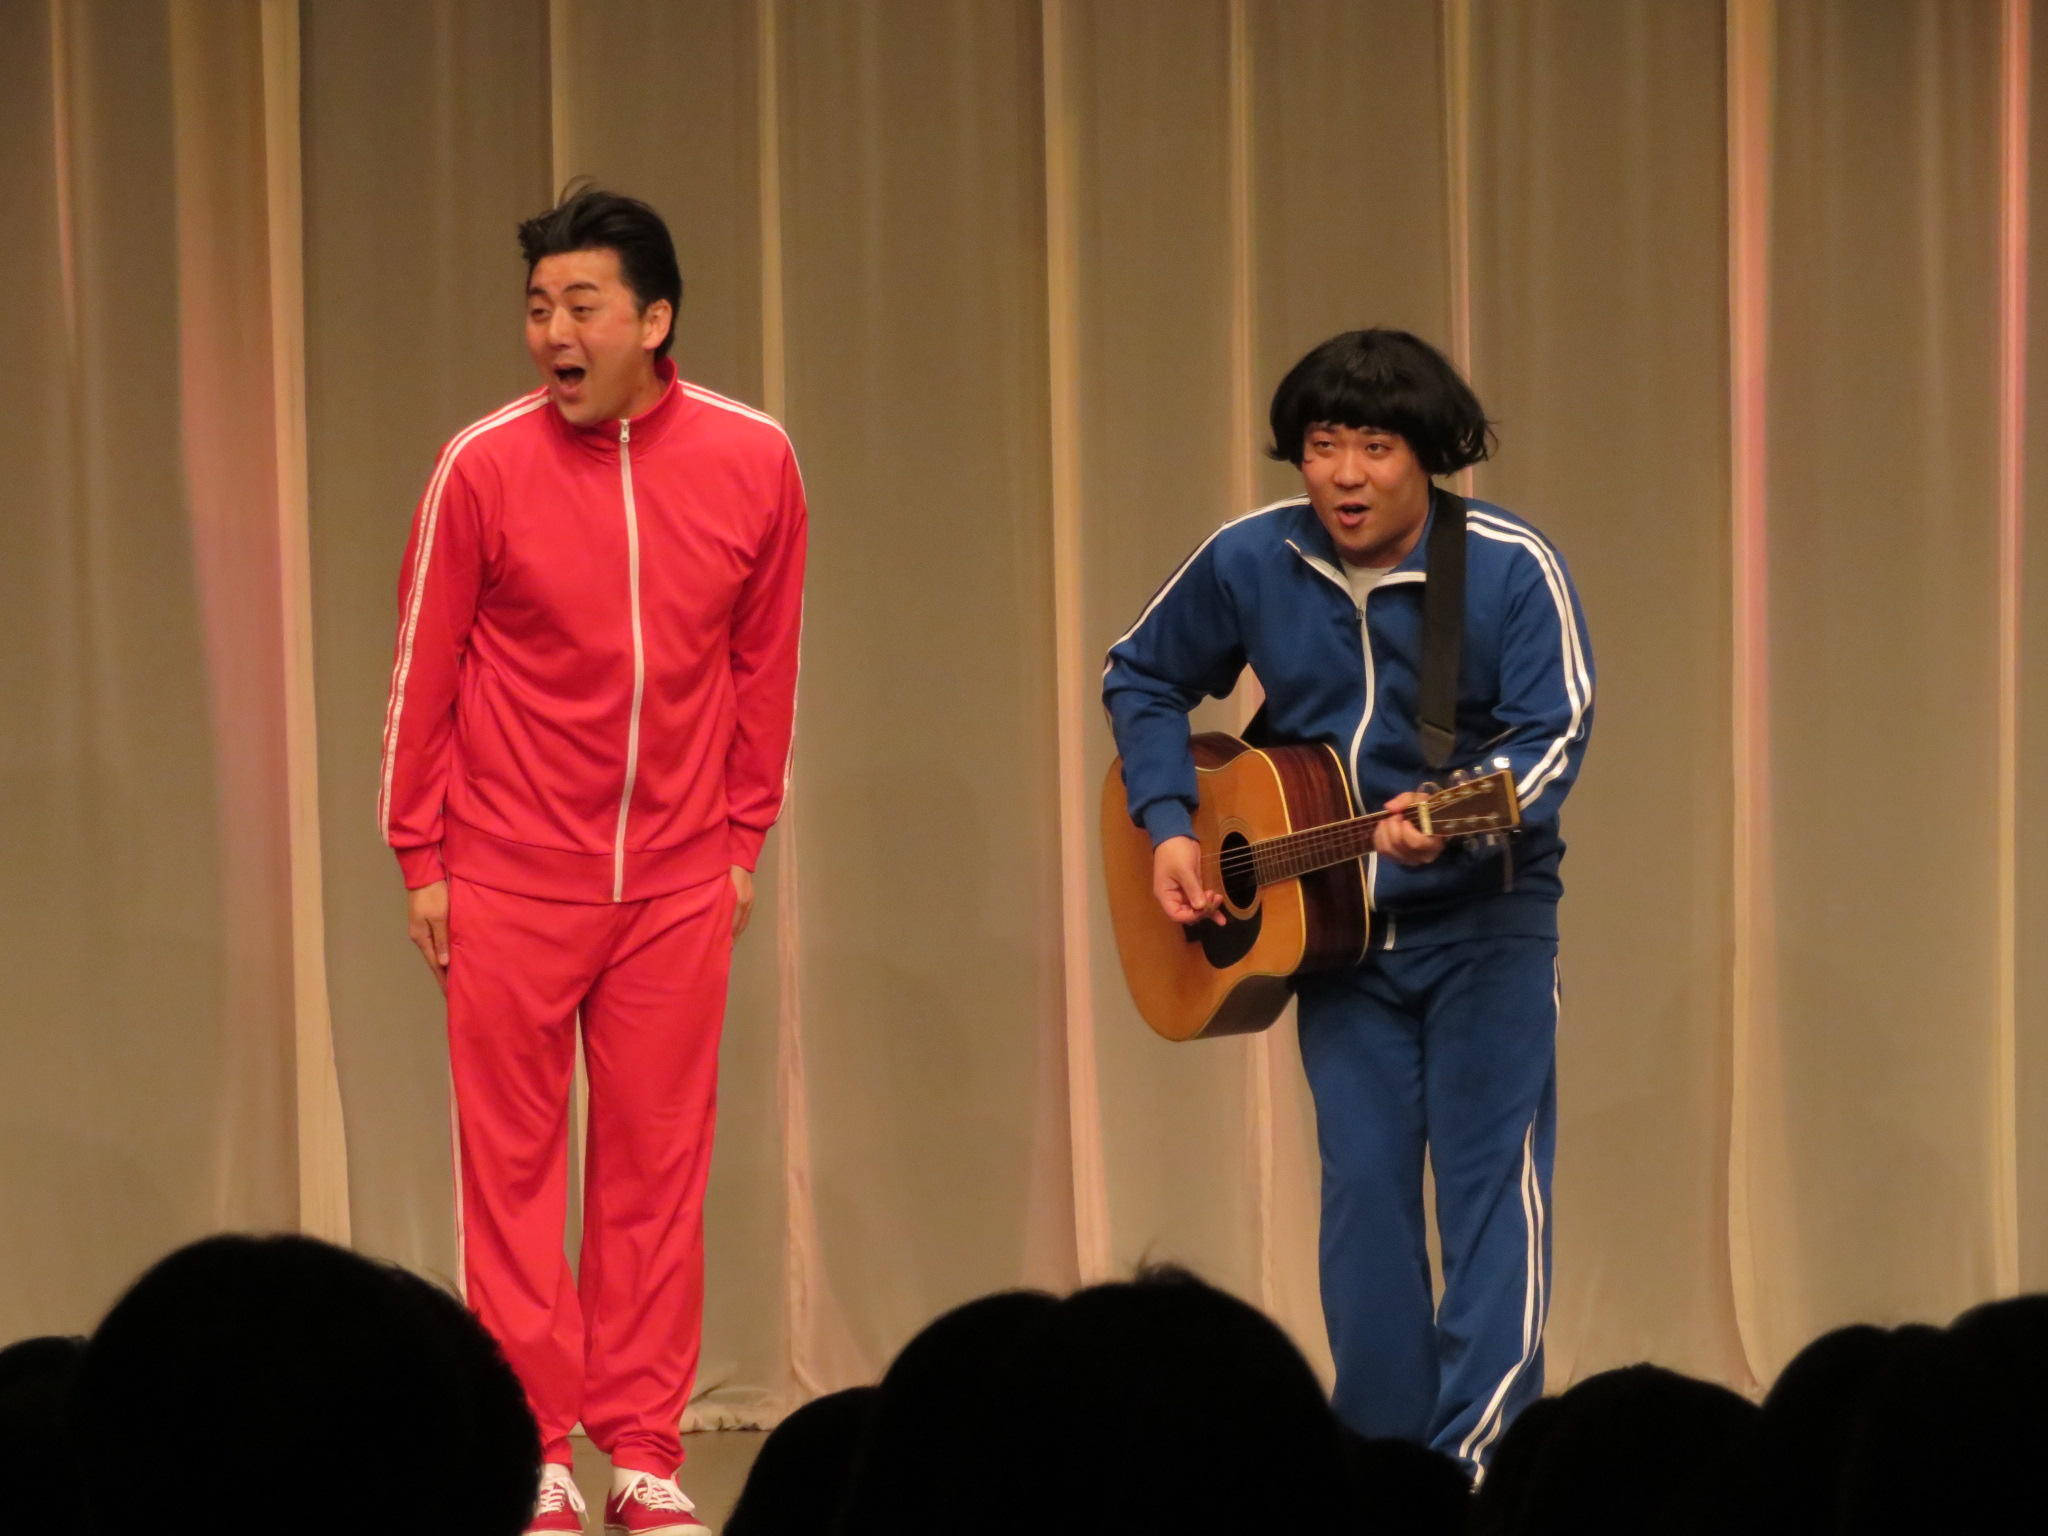 http://news.yoshimoto.co.jp/20180110190538-e16d51e36c3a50de36e8490668a8acd58fc136ce.jpg